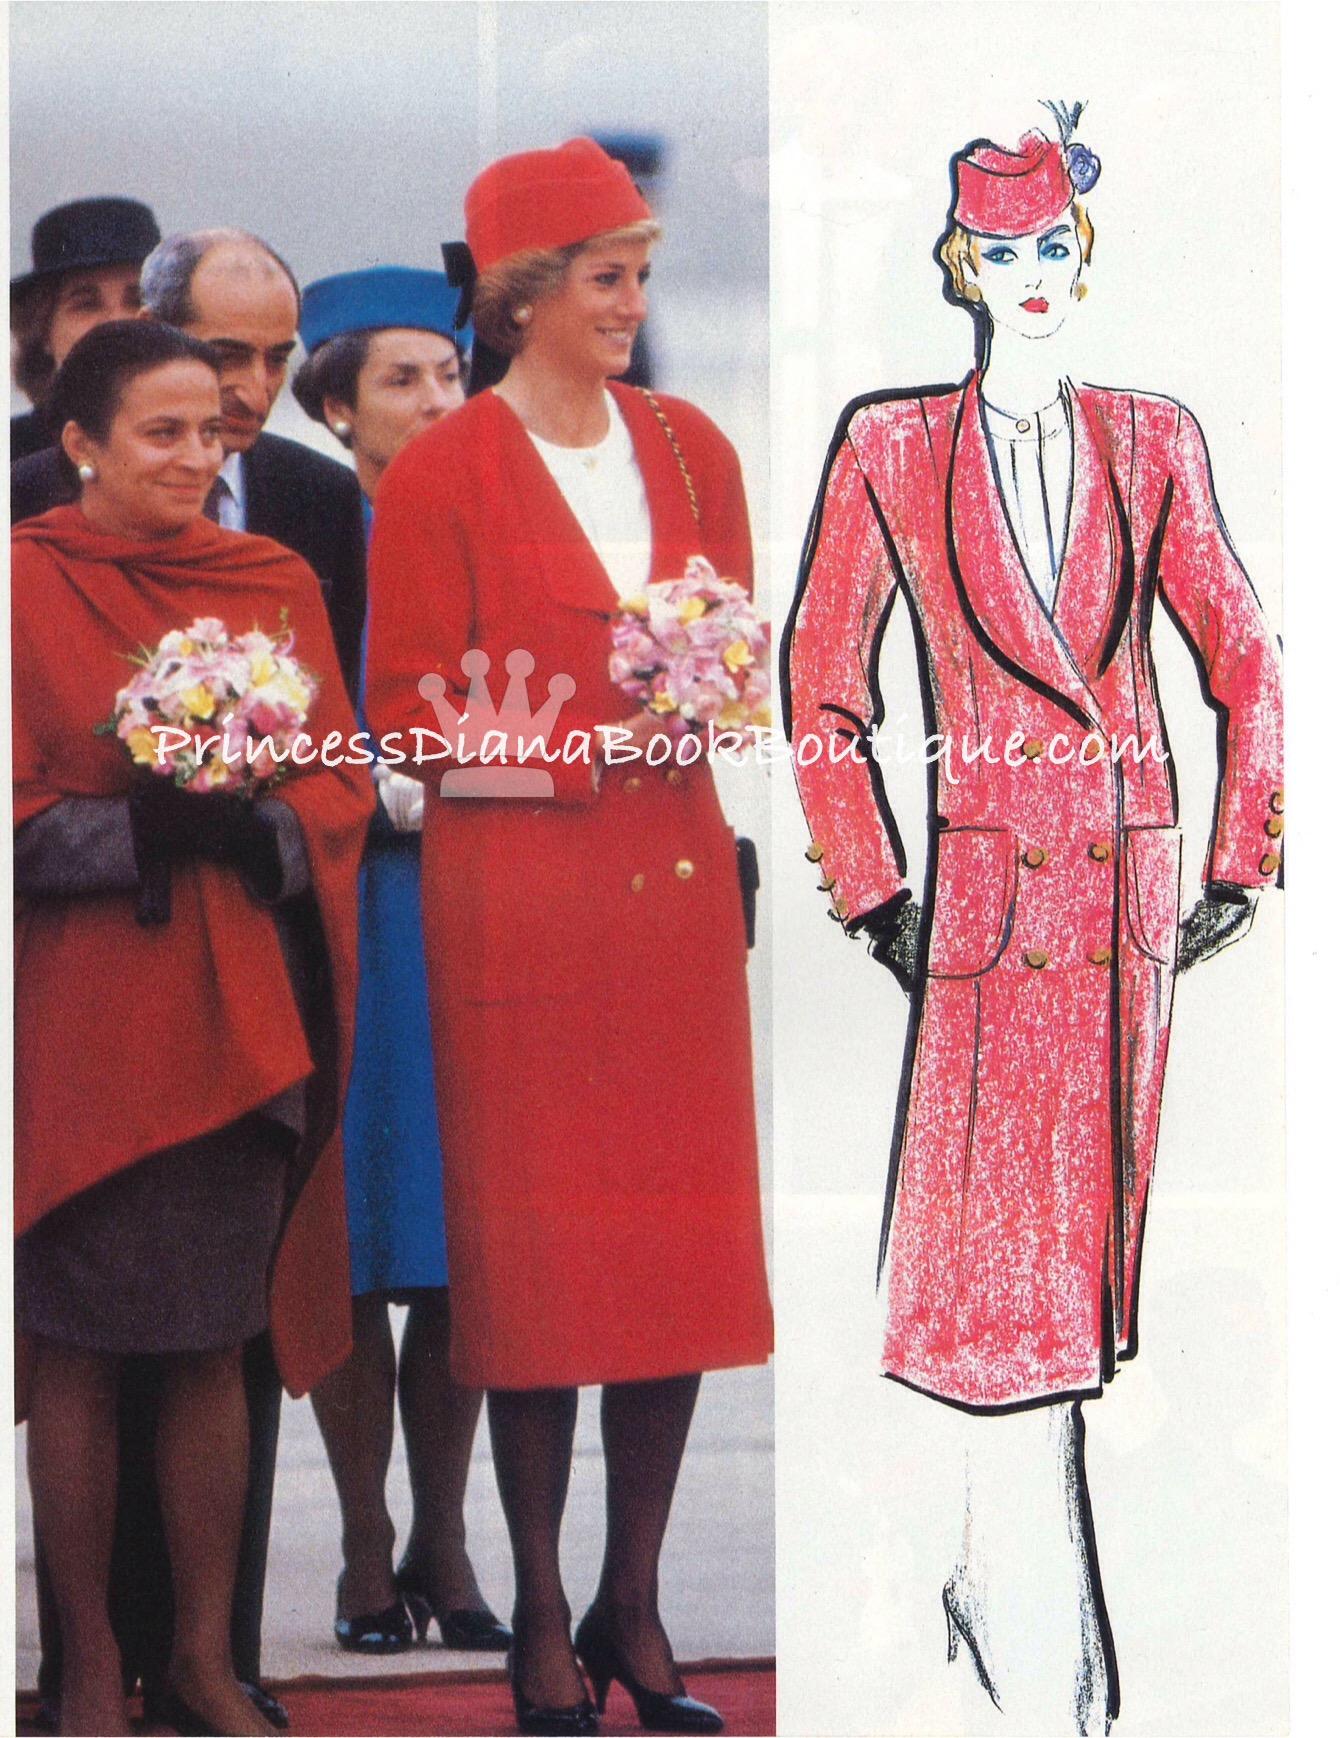 Princess Diana Early Fashions Princess Diana News Blog